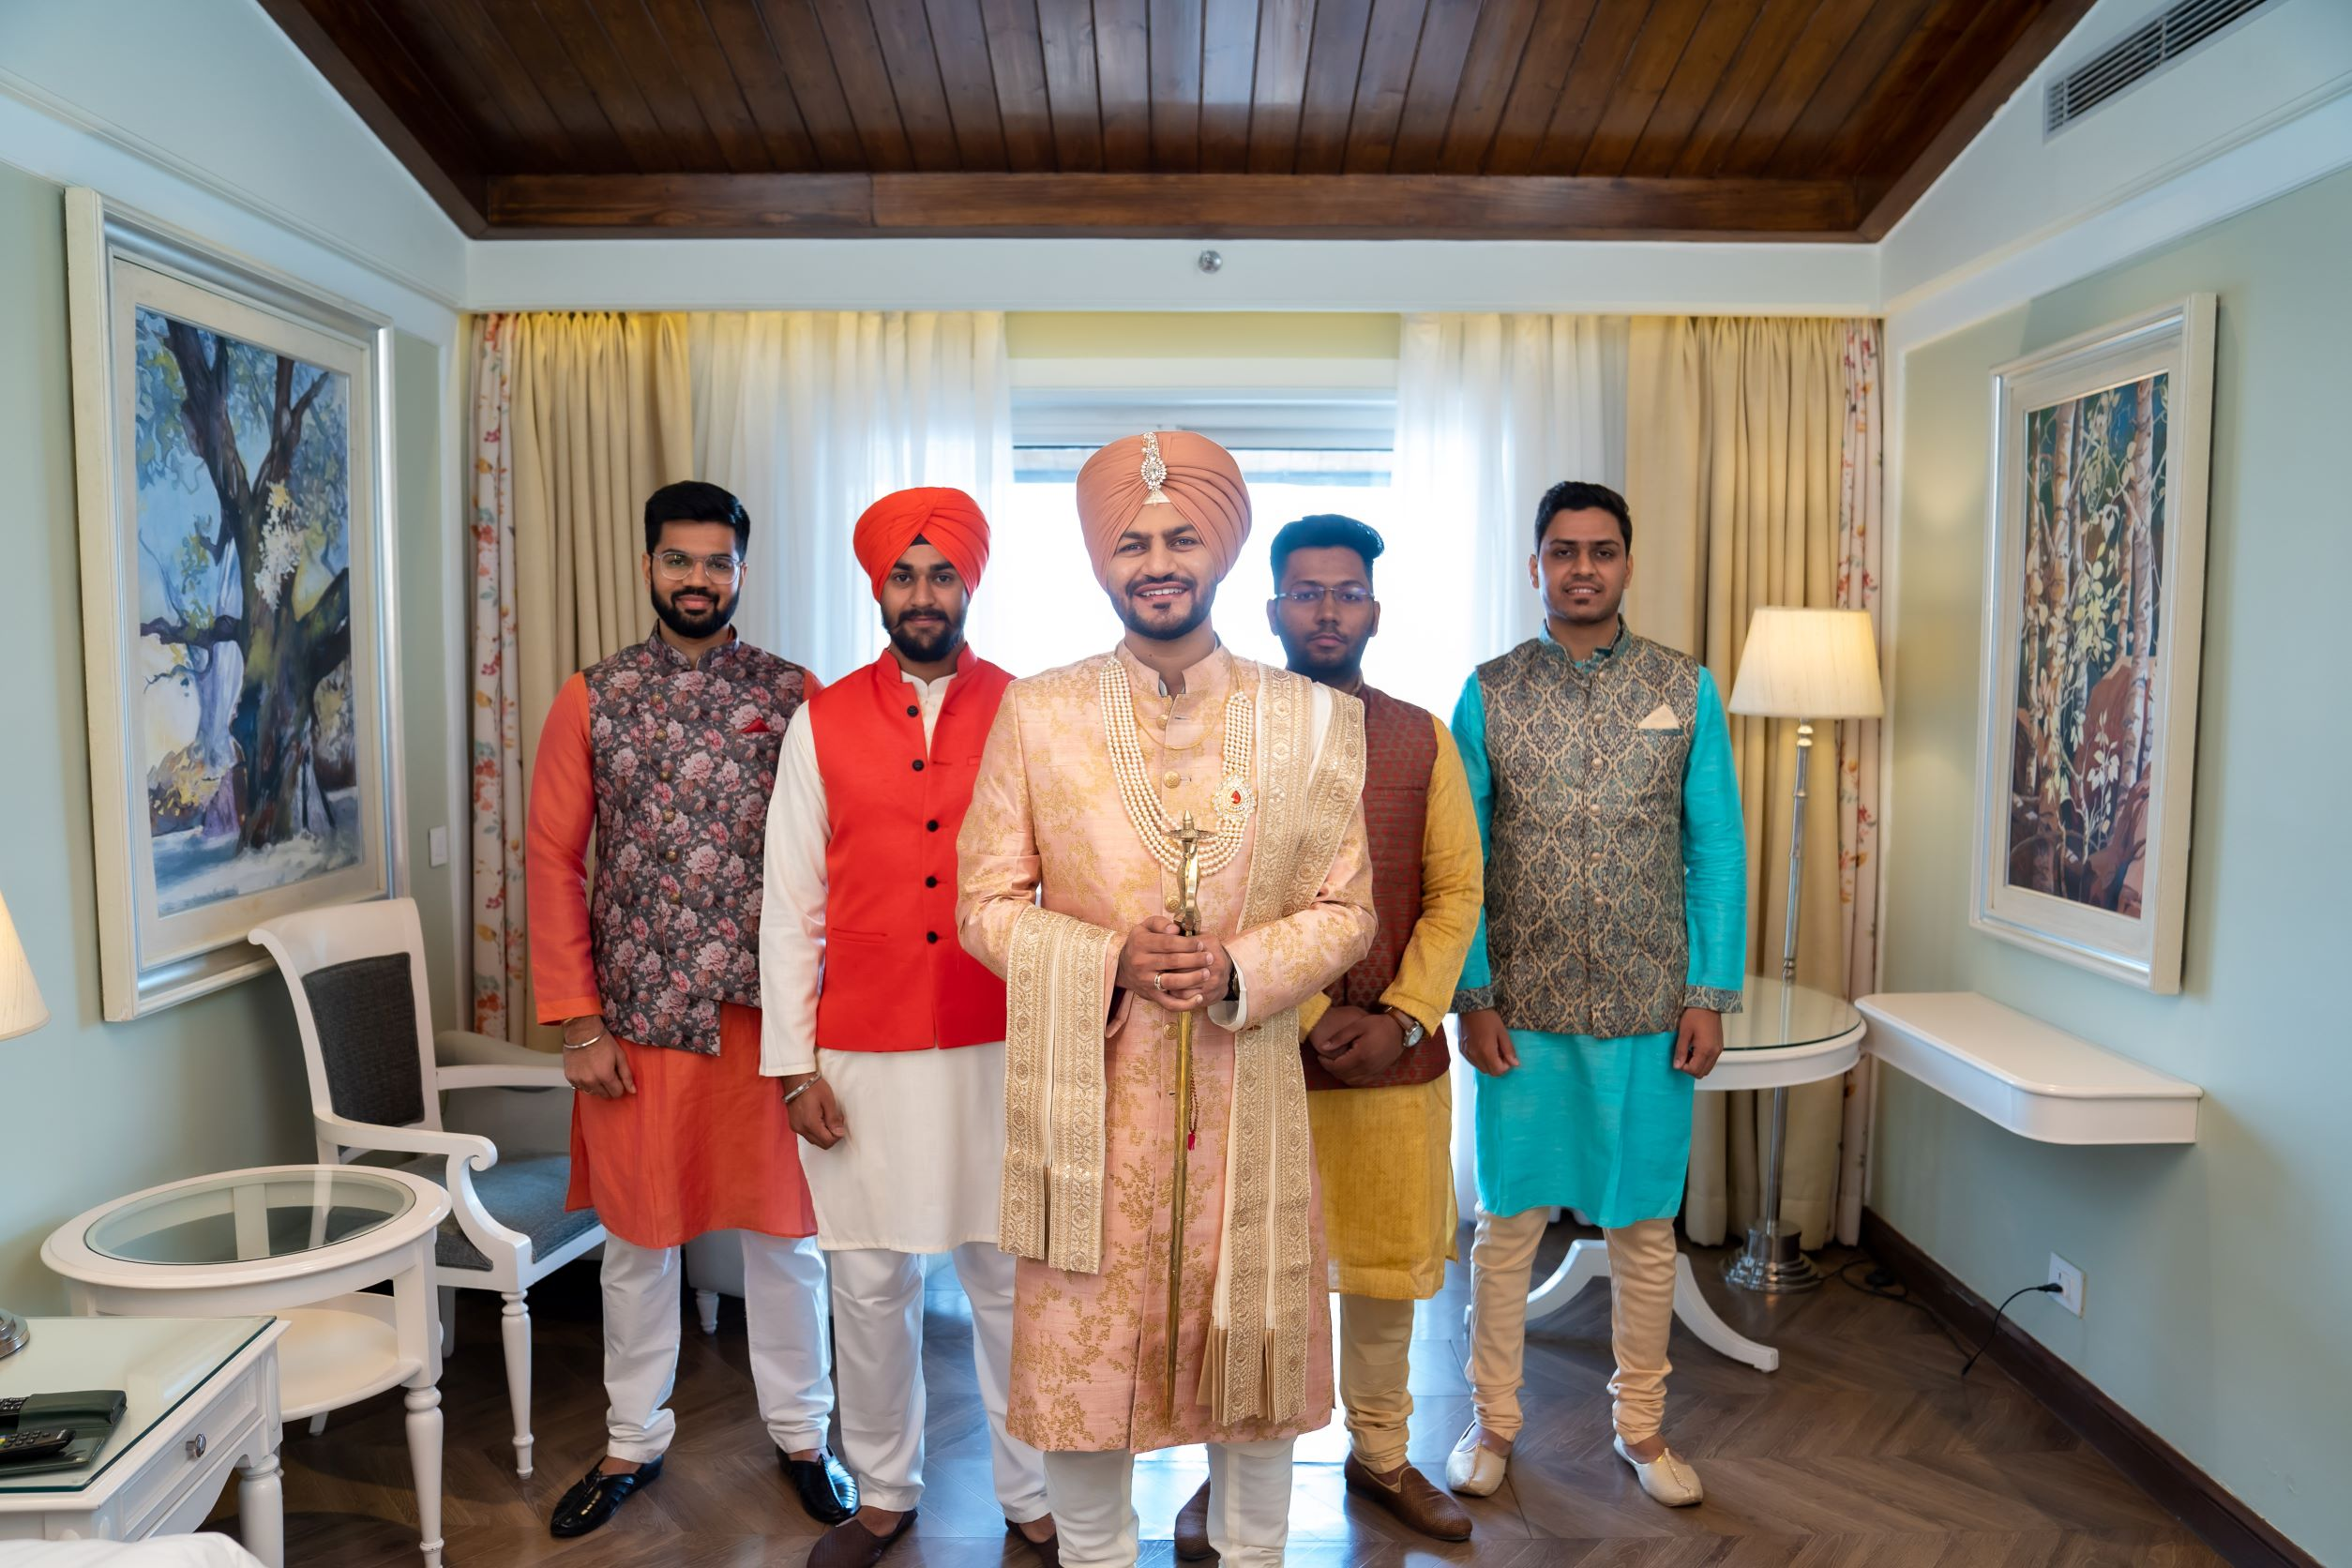 punjabi groom poses with his groomsmen